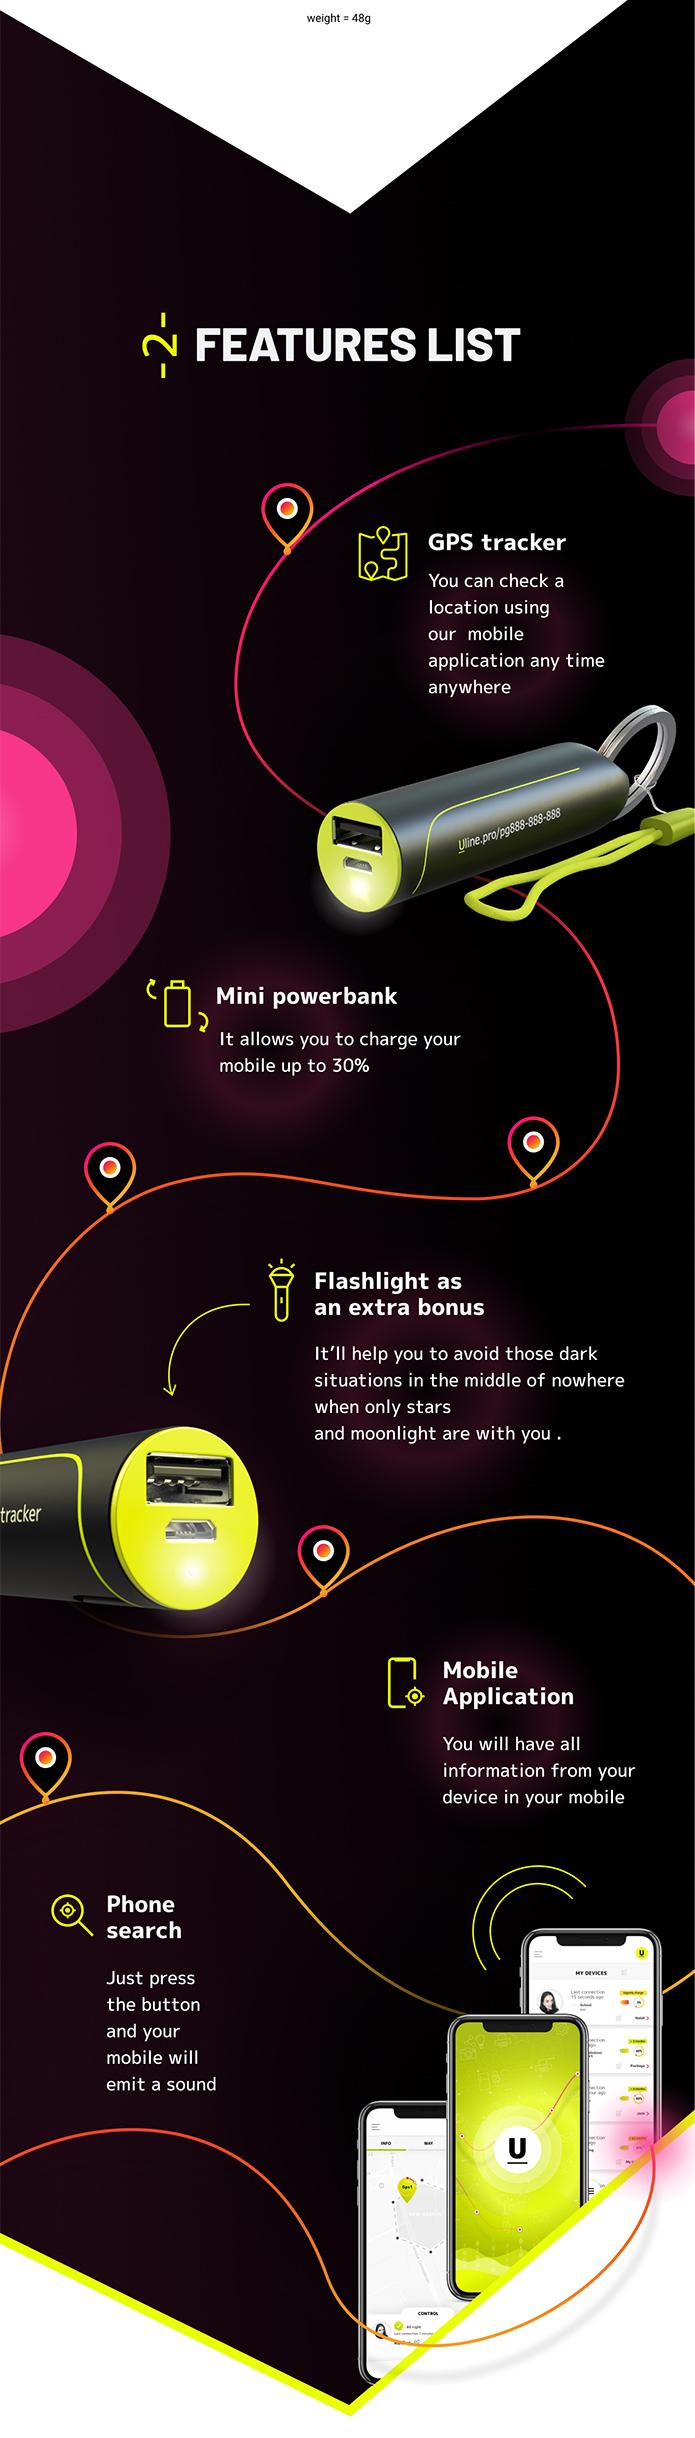 Smart Keychain, Uline, GPS, Power Bank, Gps tracker